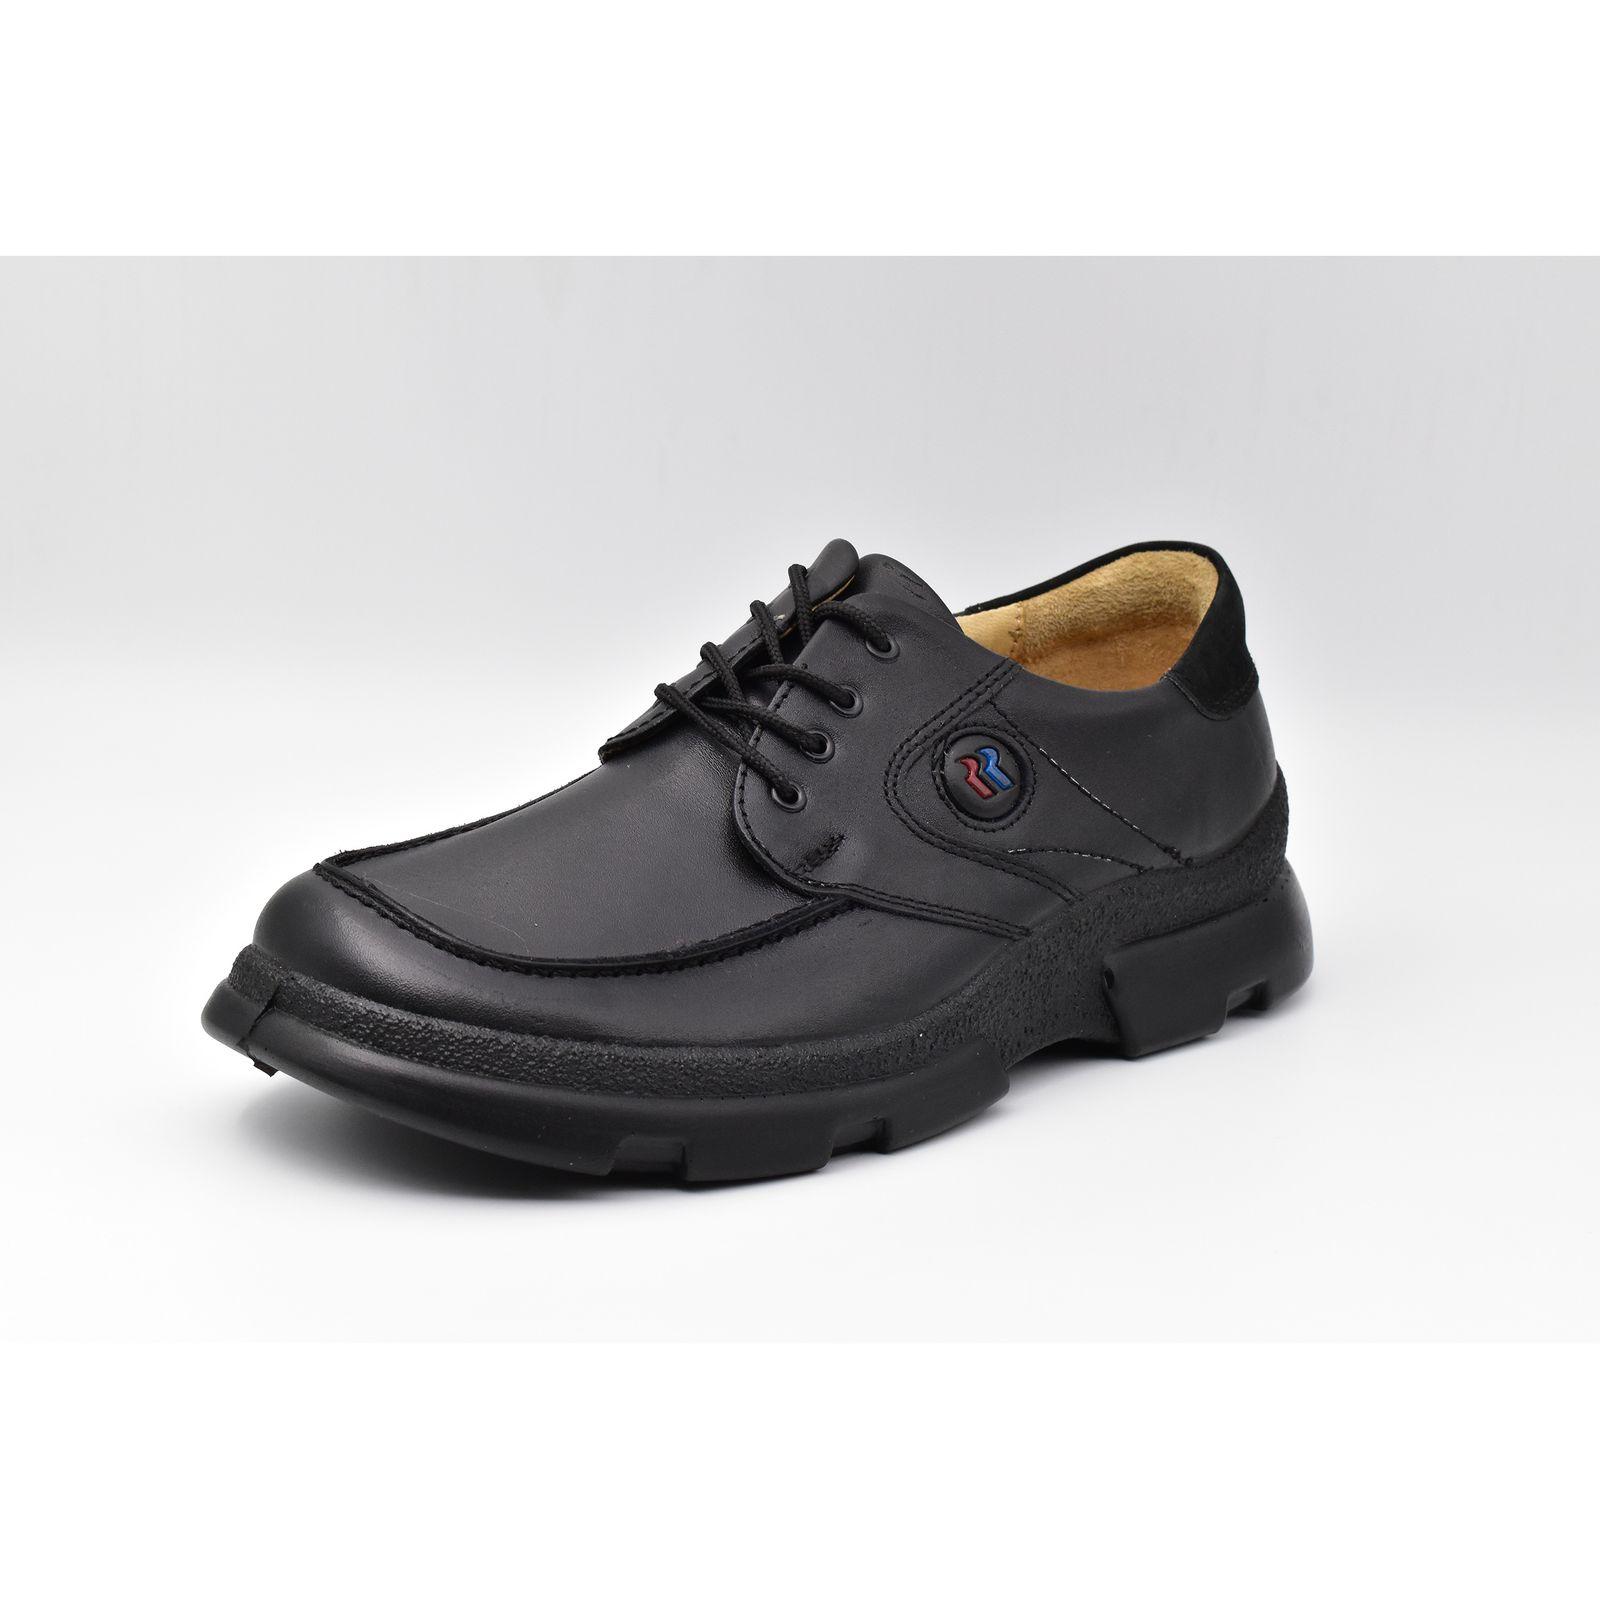 کفش روزمره مردانه البرز مدل تورنتو کد 7009 -  - 10